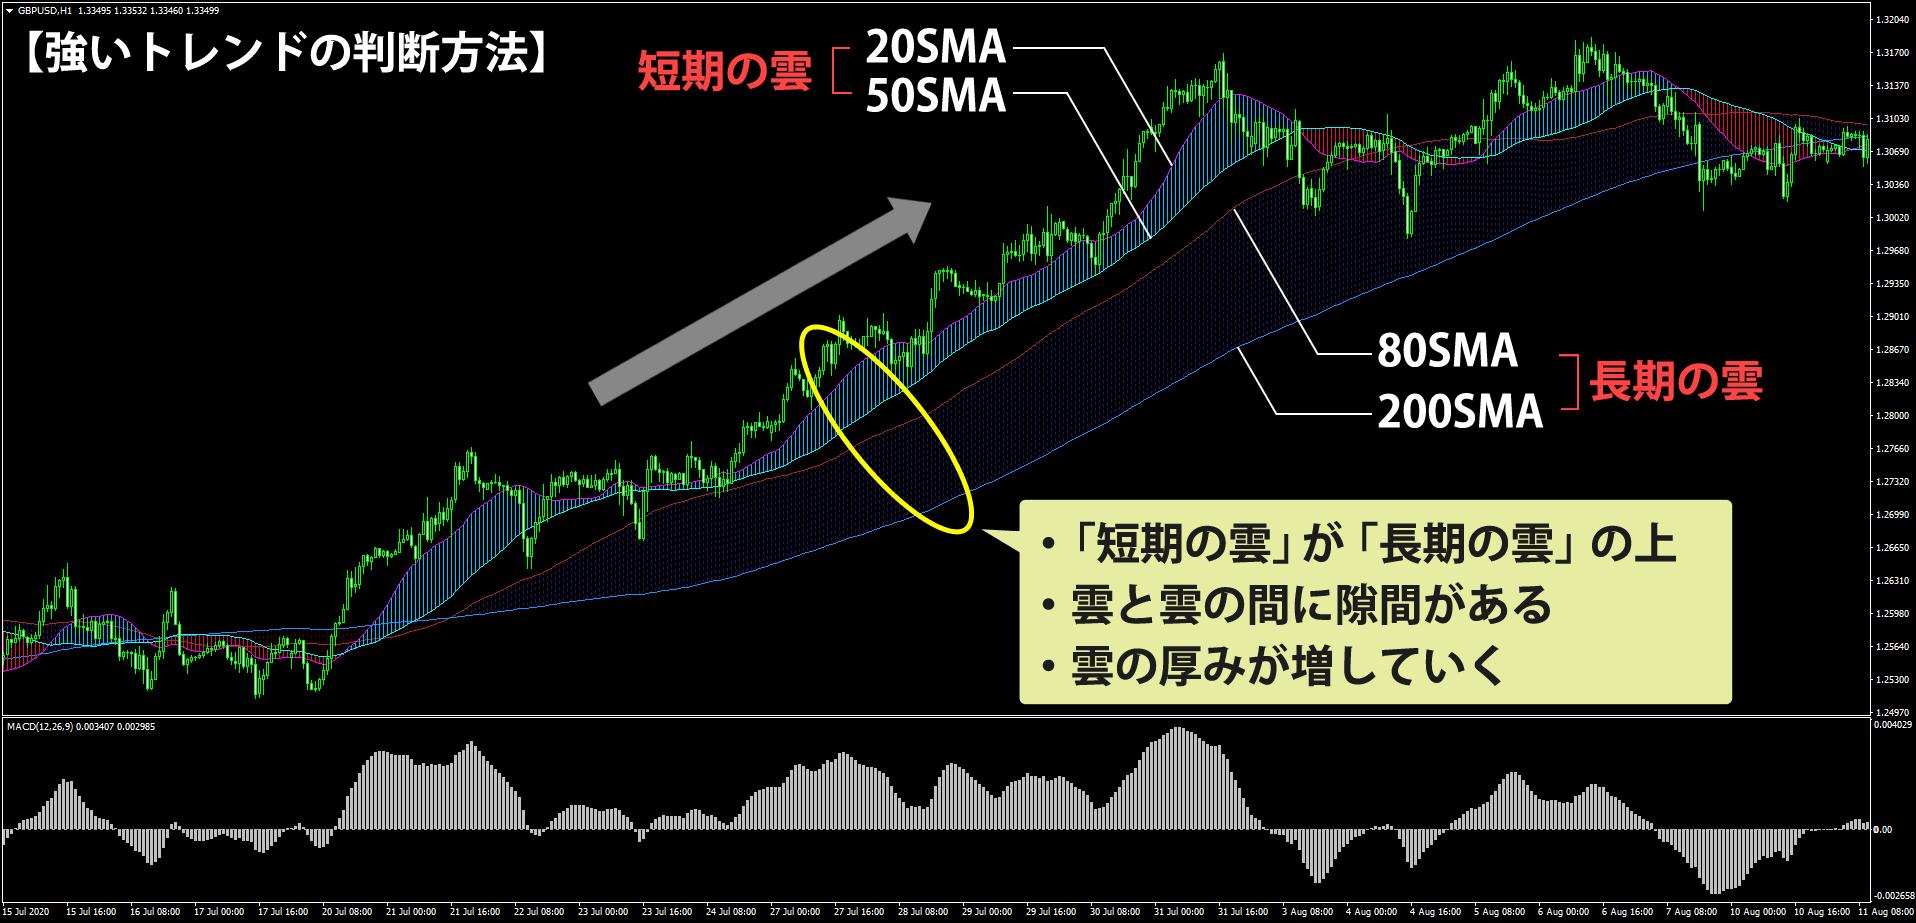 MA ribbon(=移動平均線)を使う強いトレンドの判断方法